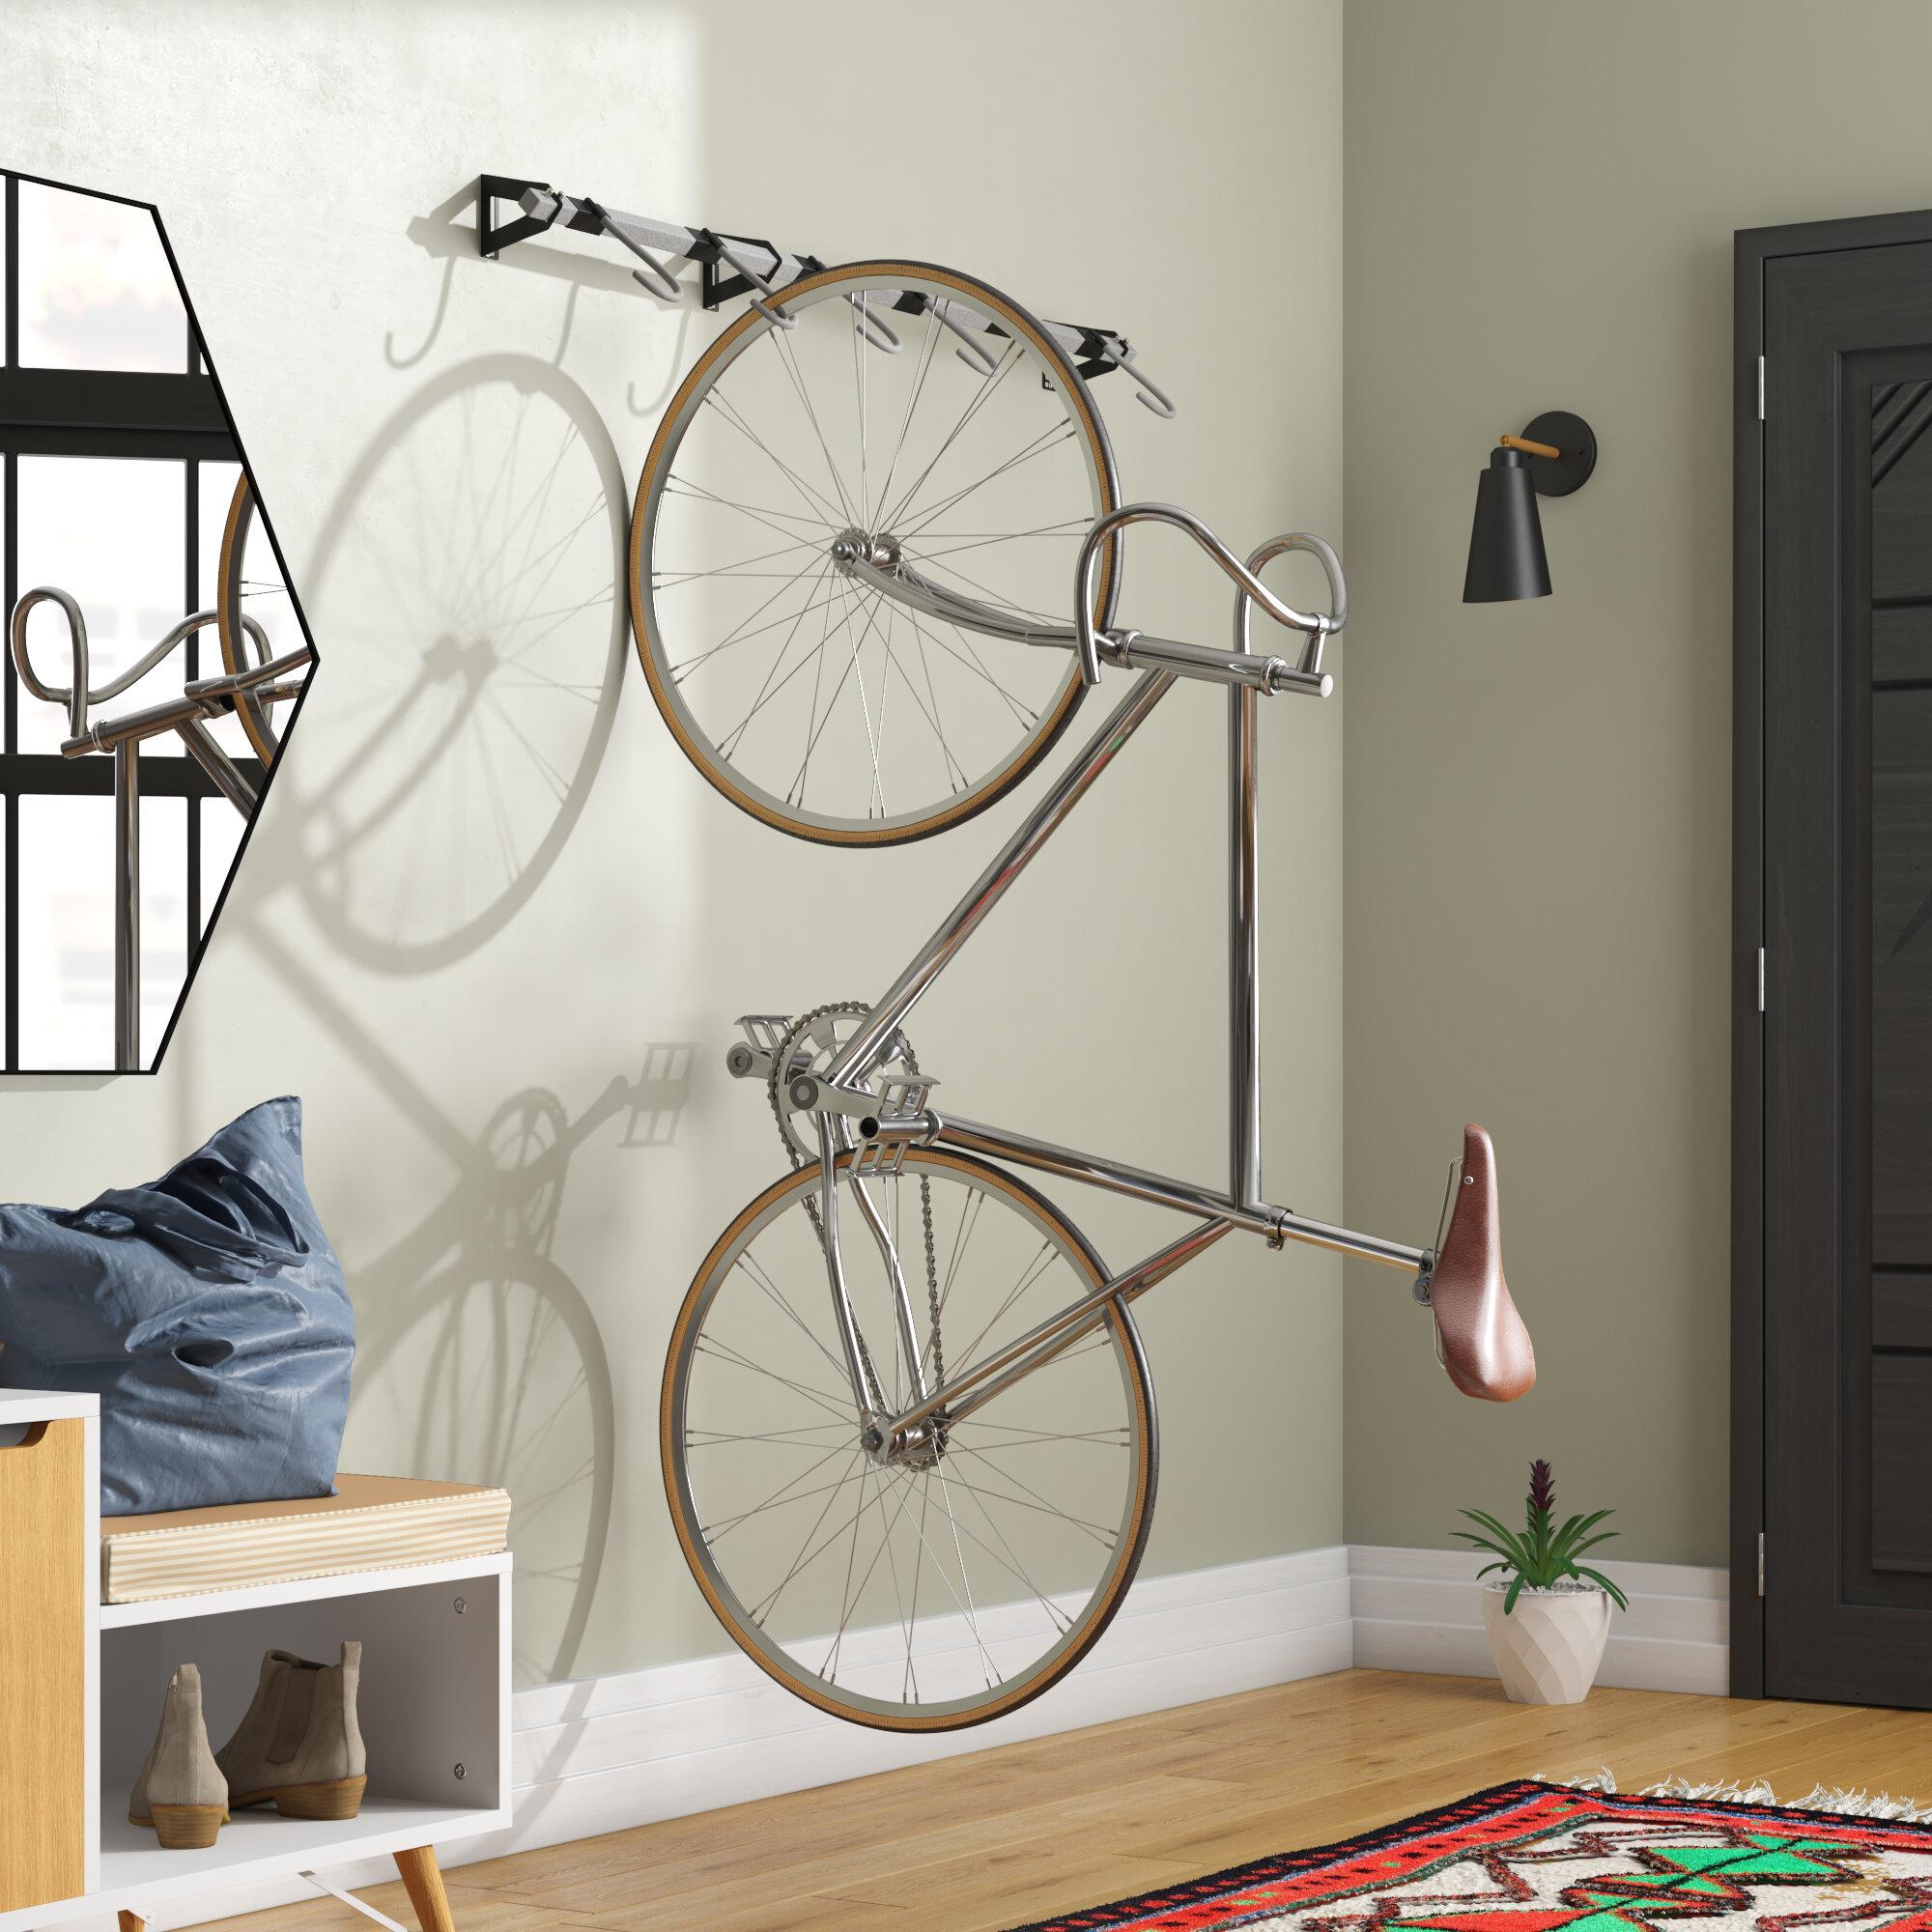 Mountain Road Bike Wall Mount Hook Indoor Storage Parking Rack Bracket Holder A+